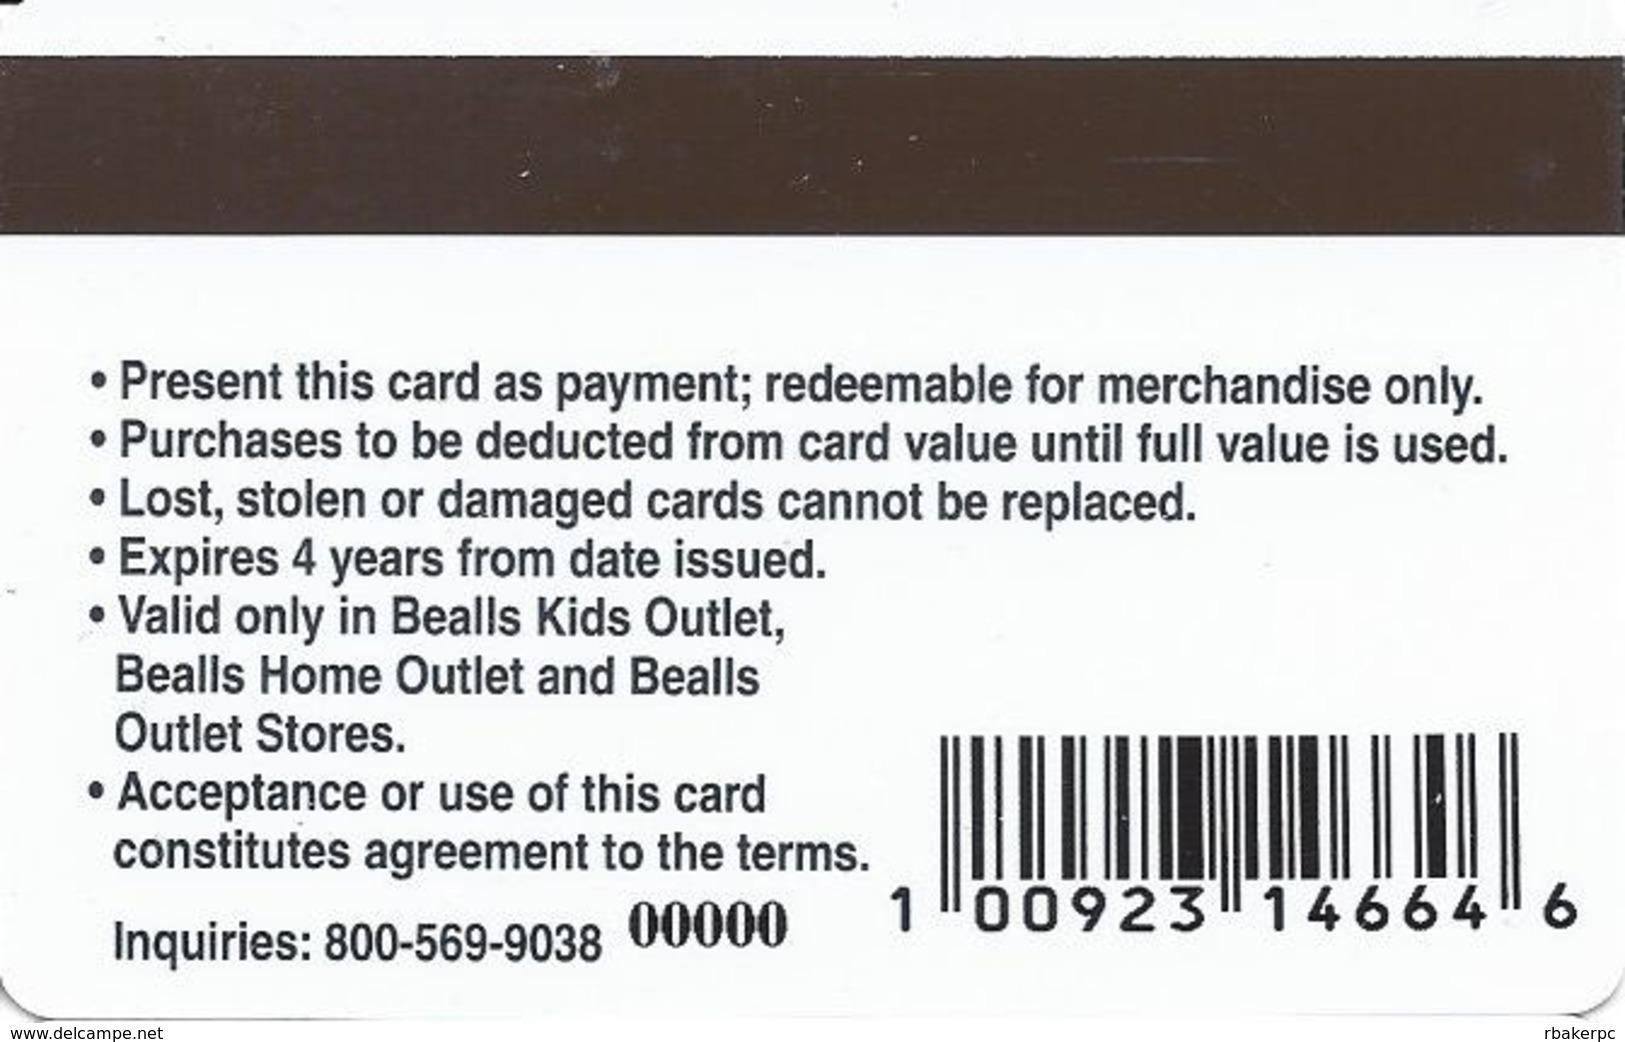 Bealls Outlet Gift Card - Gift Cards